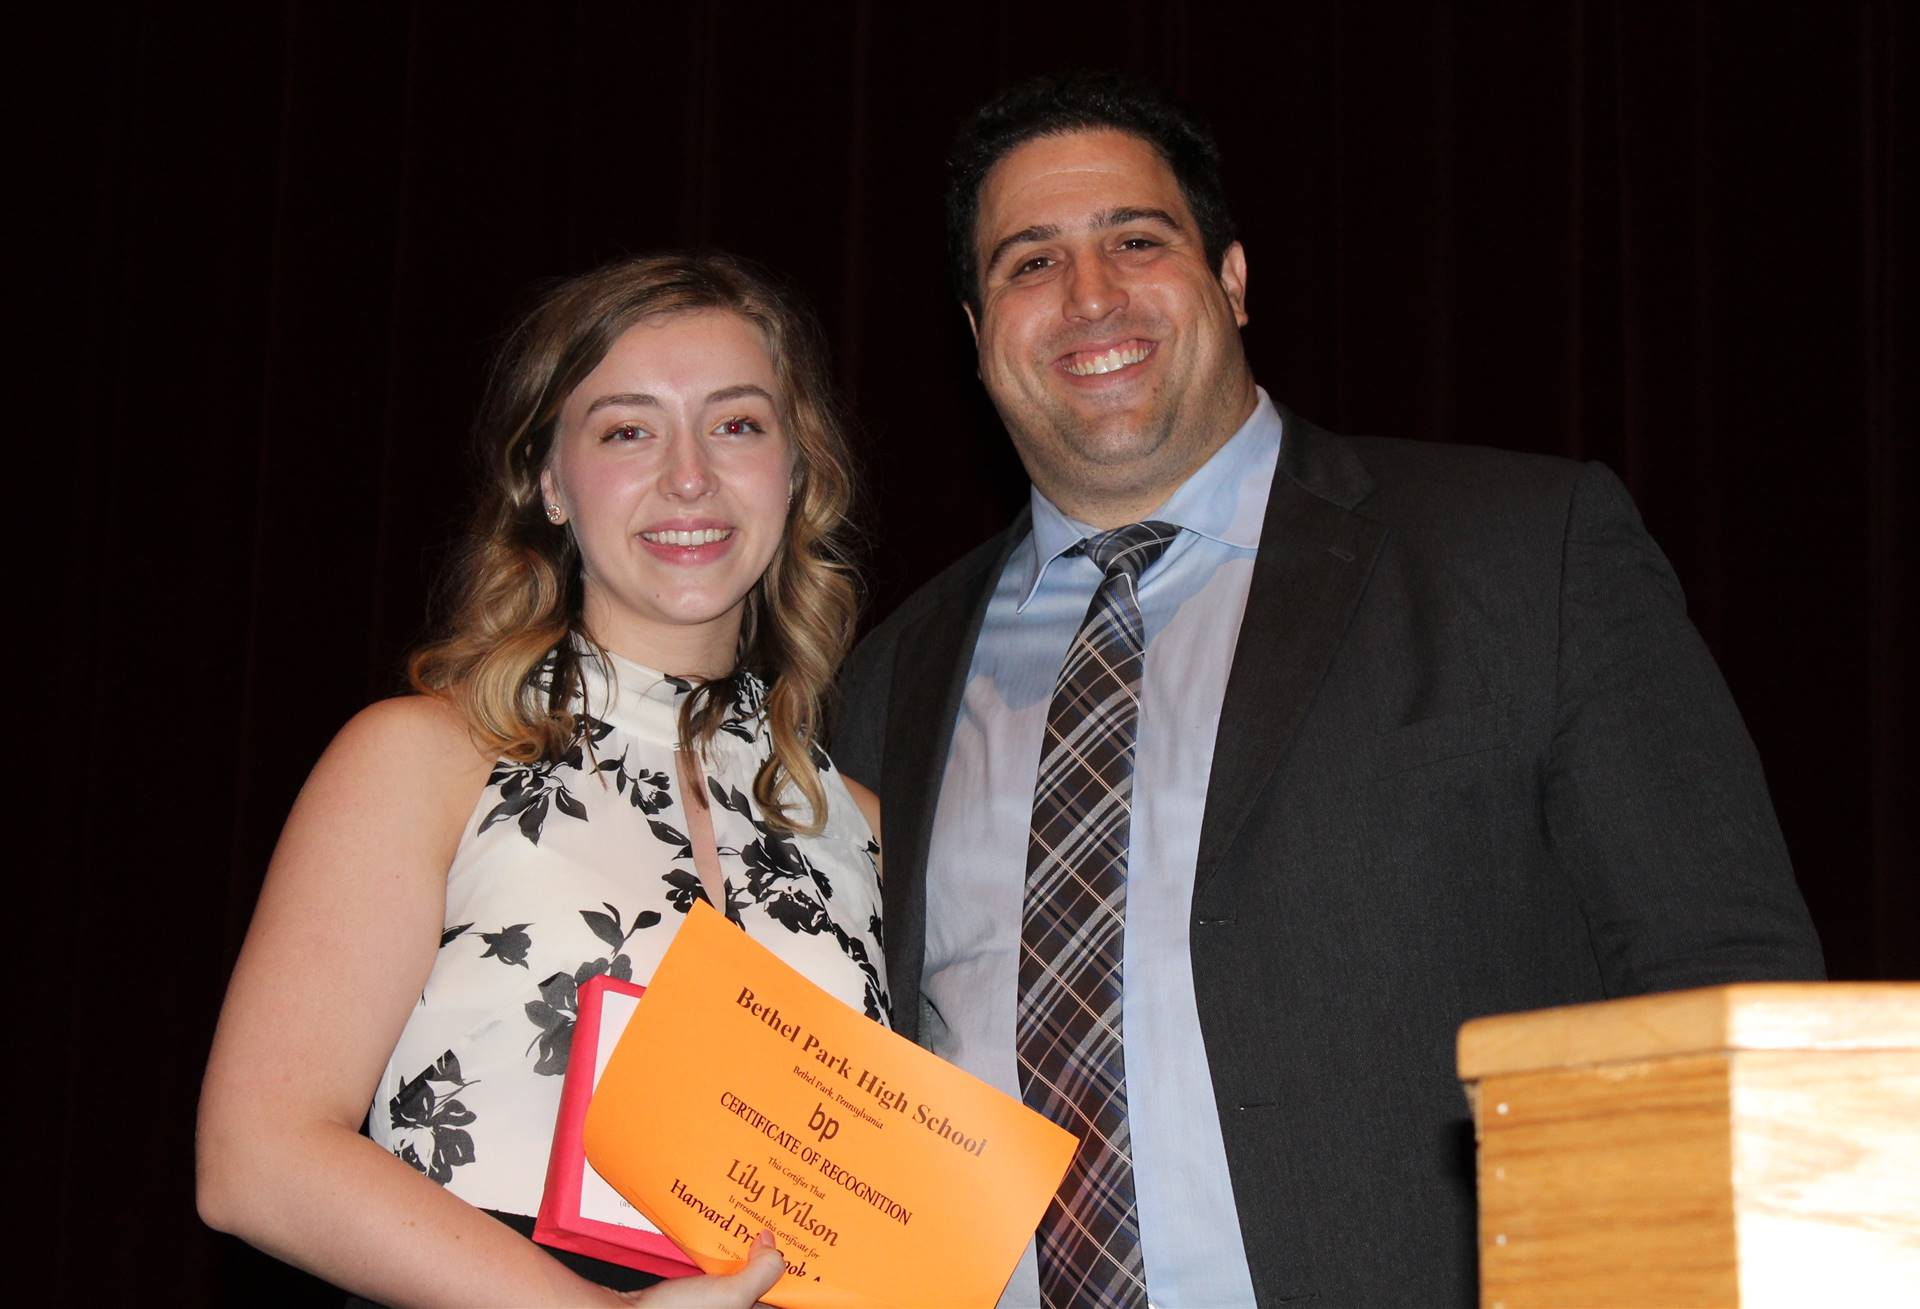 Student receiving a Book Award